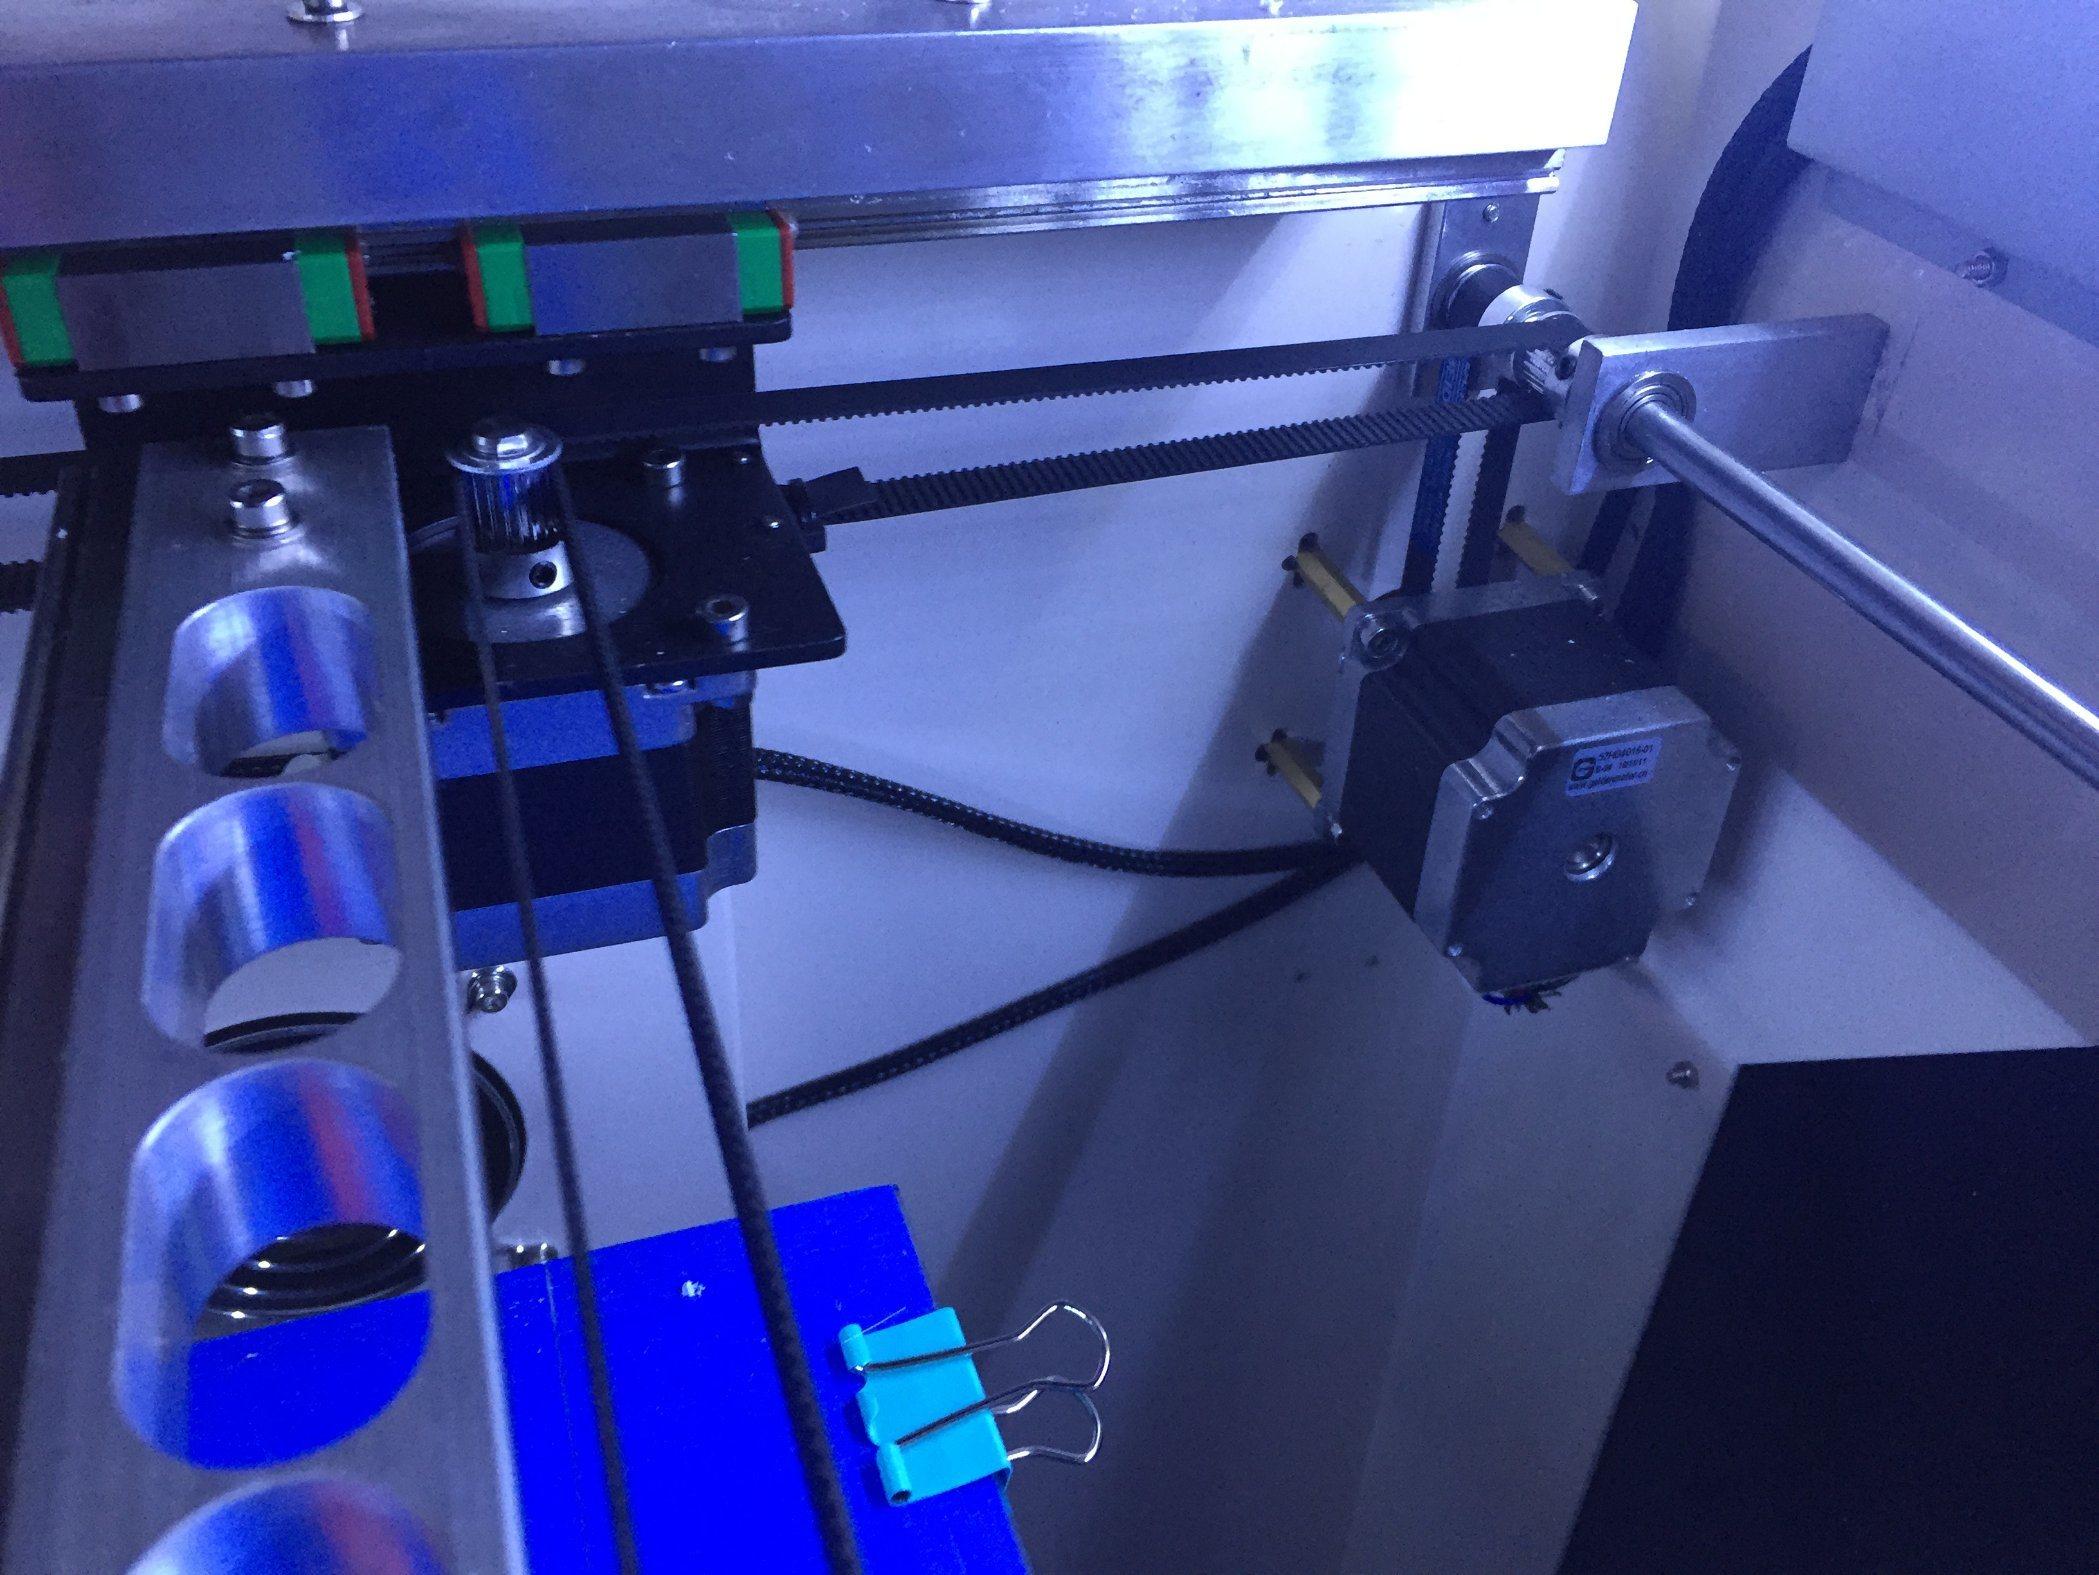 Allcct 500*500*800mm Building Size 0.05mm Precision Fdm Industrial 3D Printer